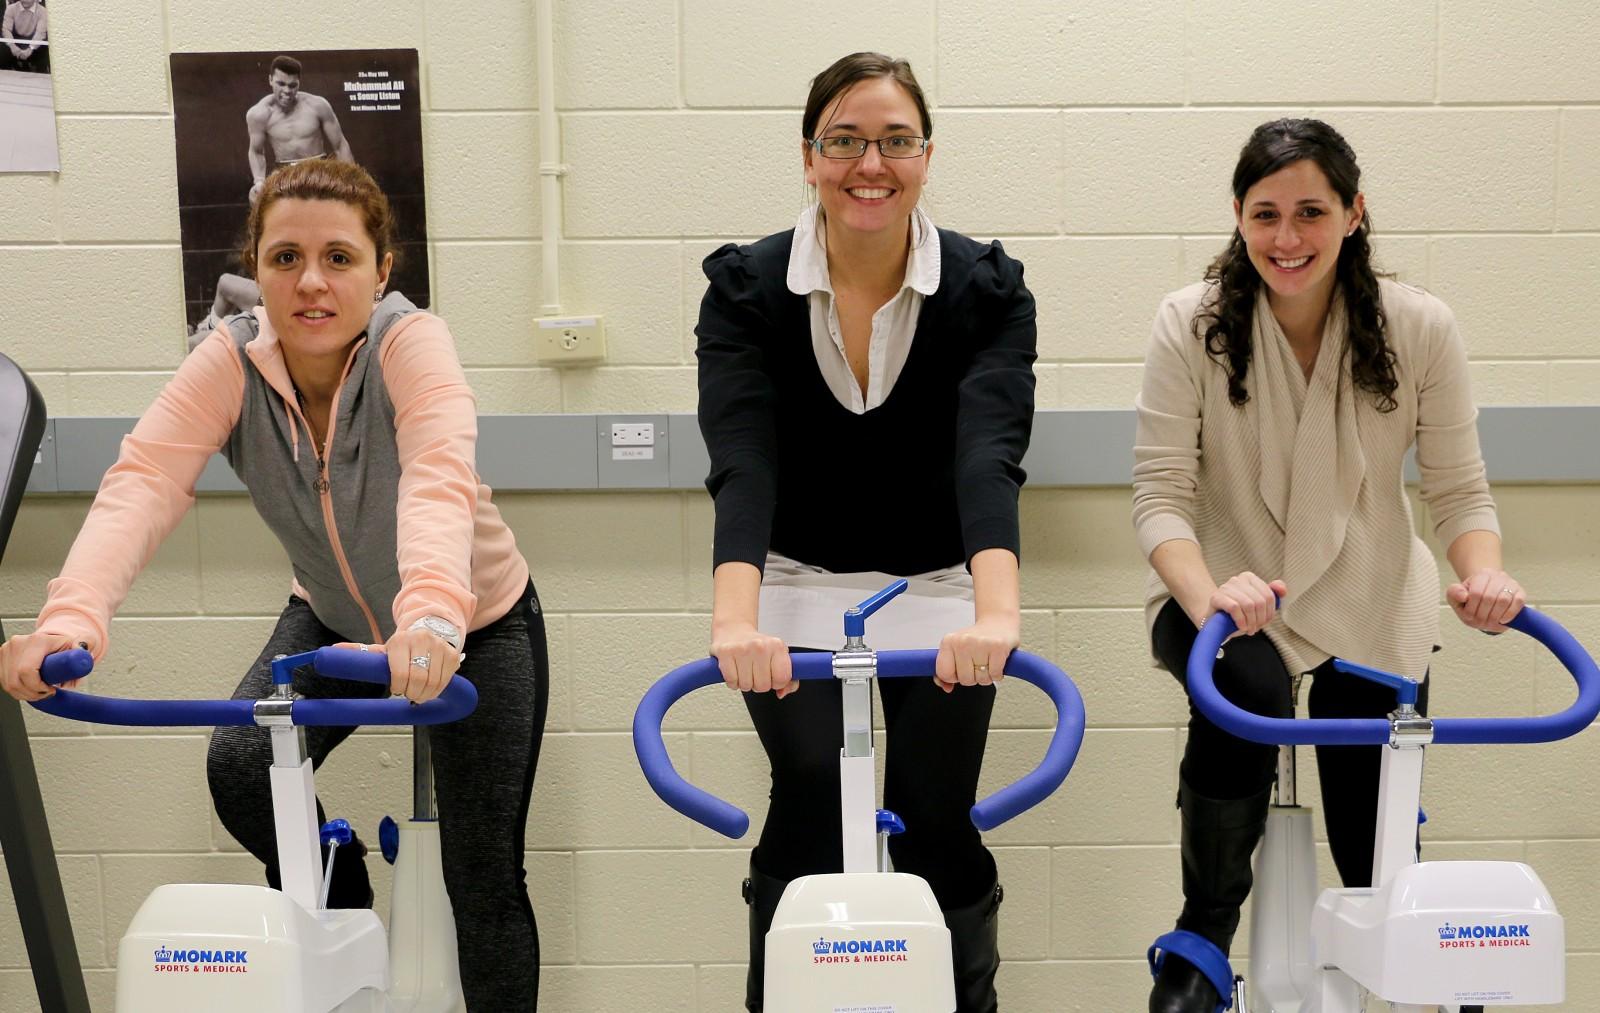 Brock University researchers Rozalia Kouvelioti, lead PhD student, Izabella Ludwa, research co-ordinator and Andrea Josse, Assistant Professor of Kinesiology.